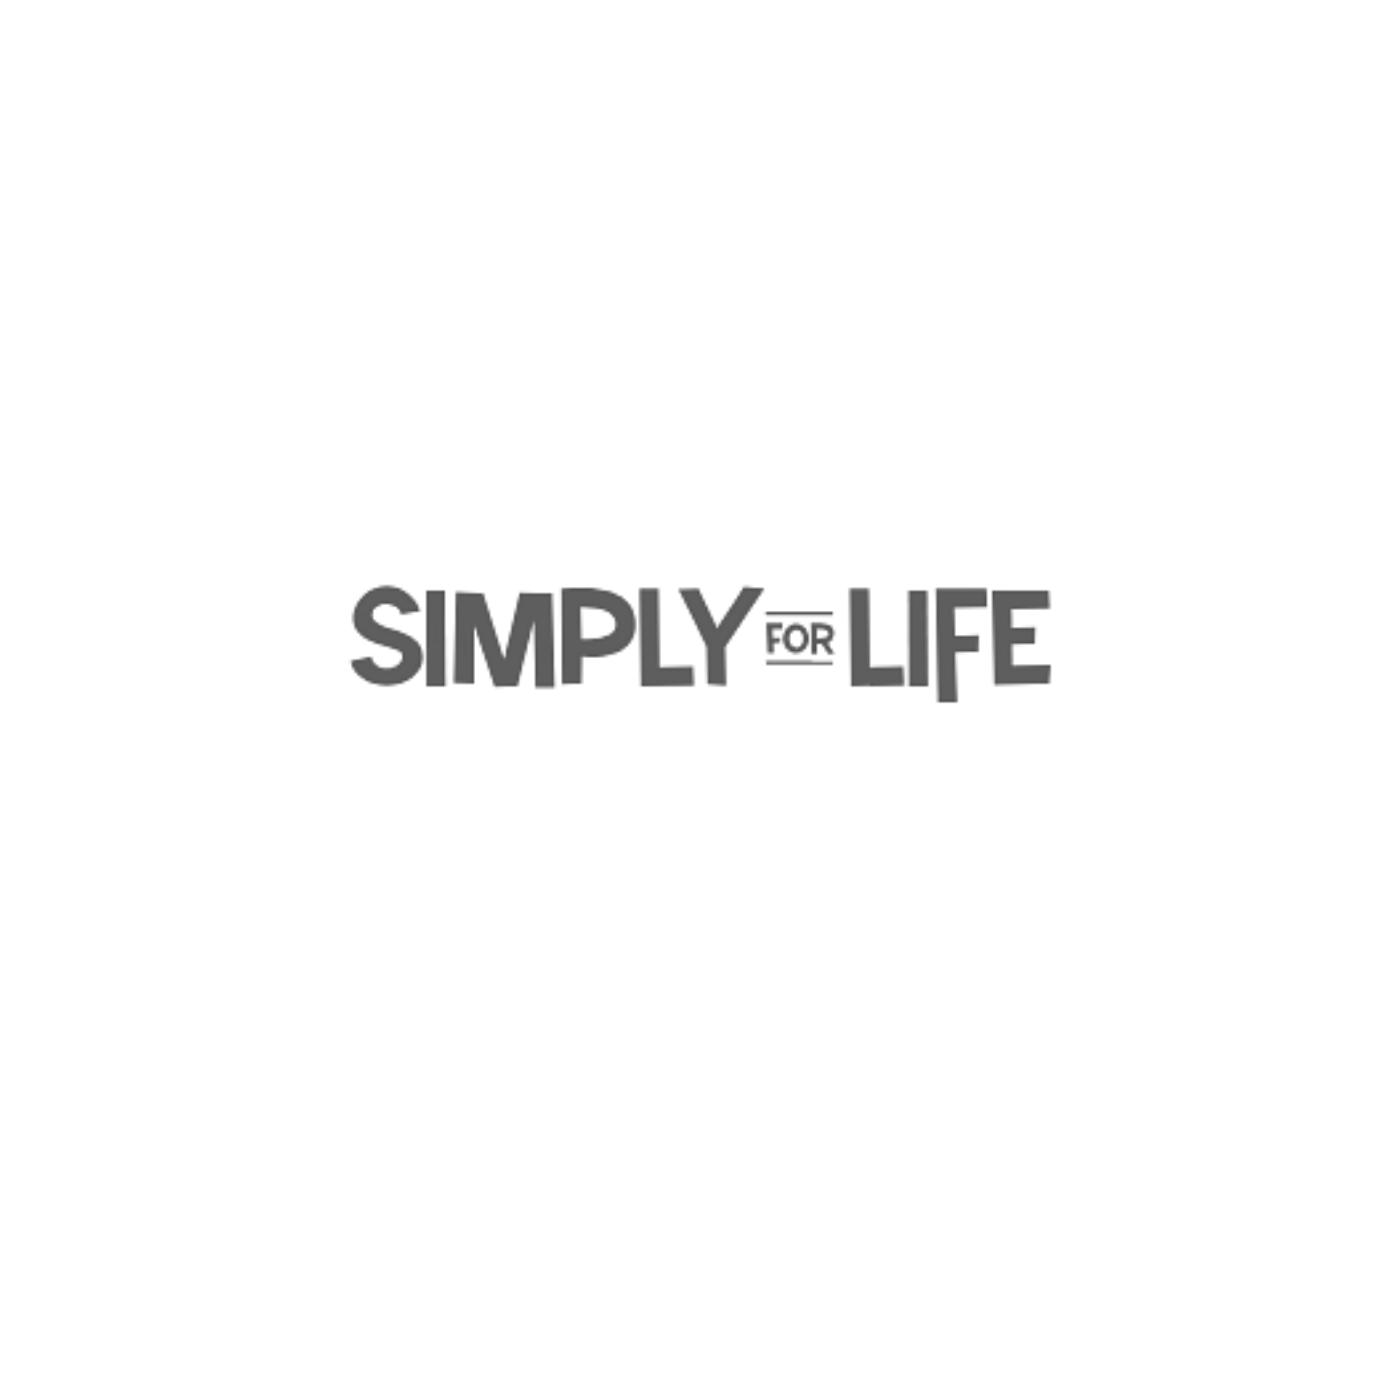 SIMPLYFORLIFE